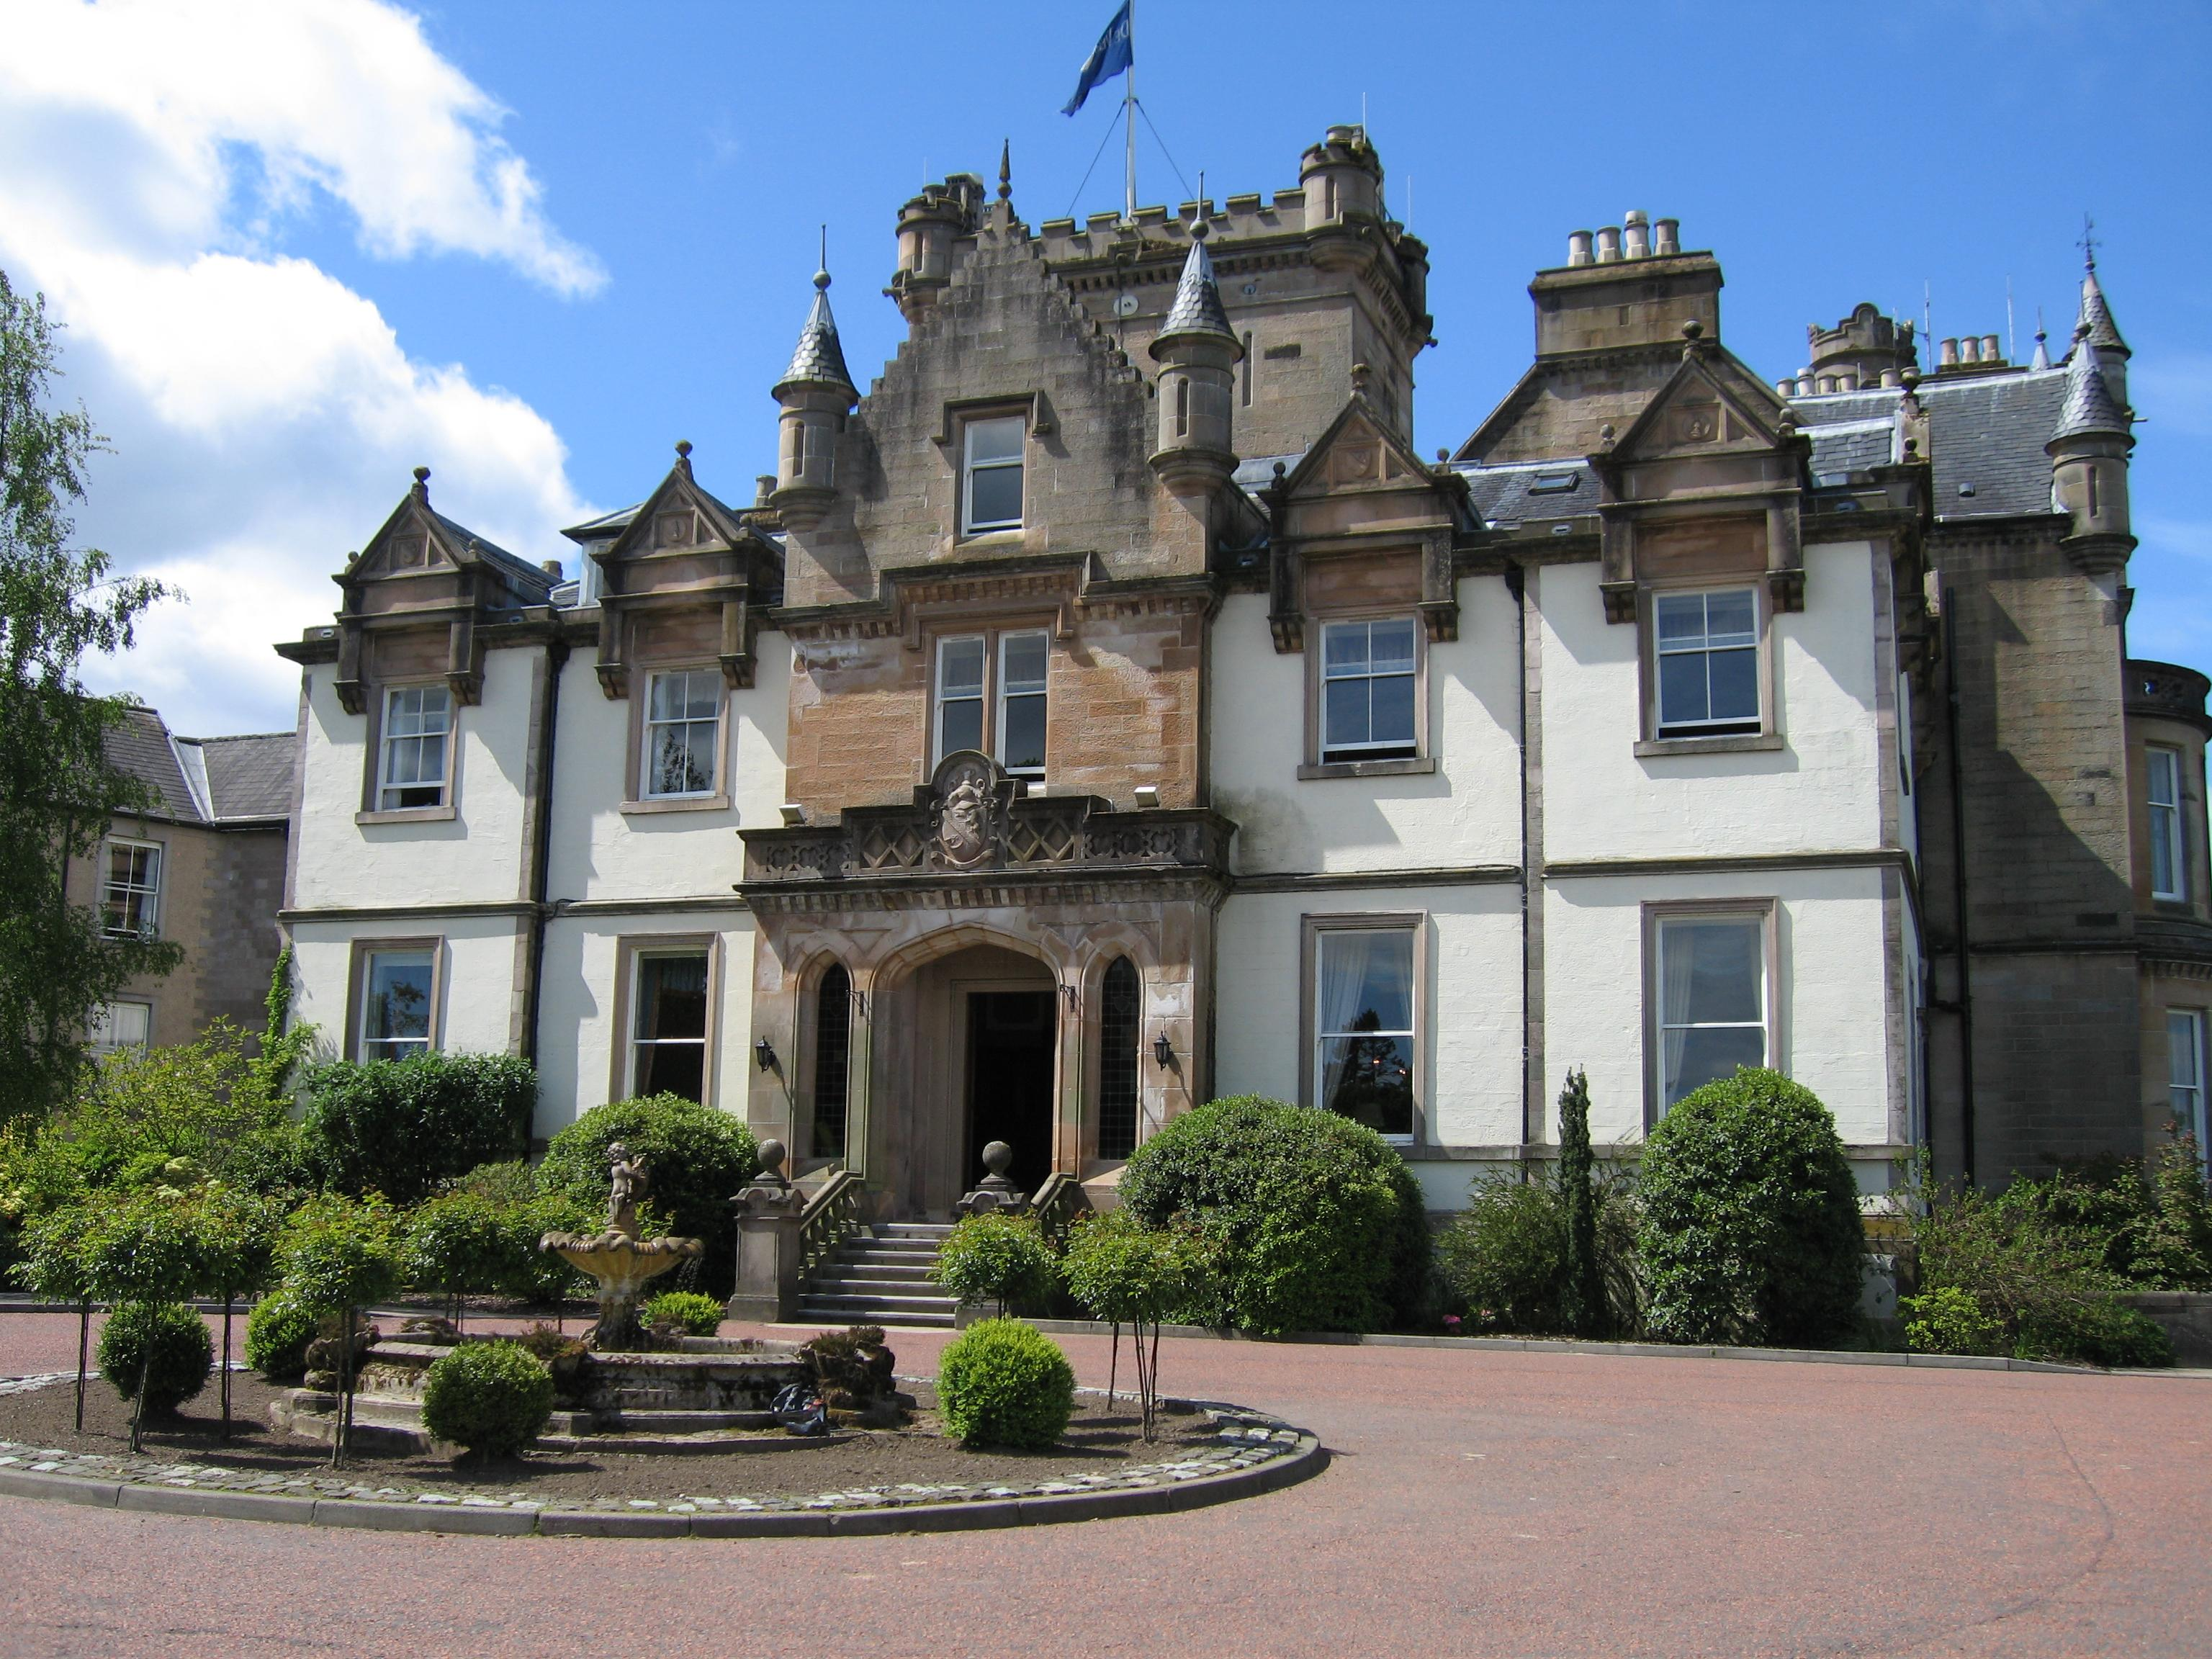 Cameron House Lodges image